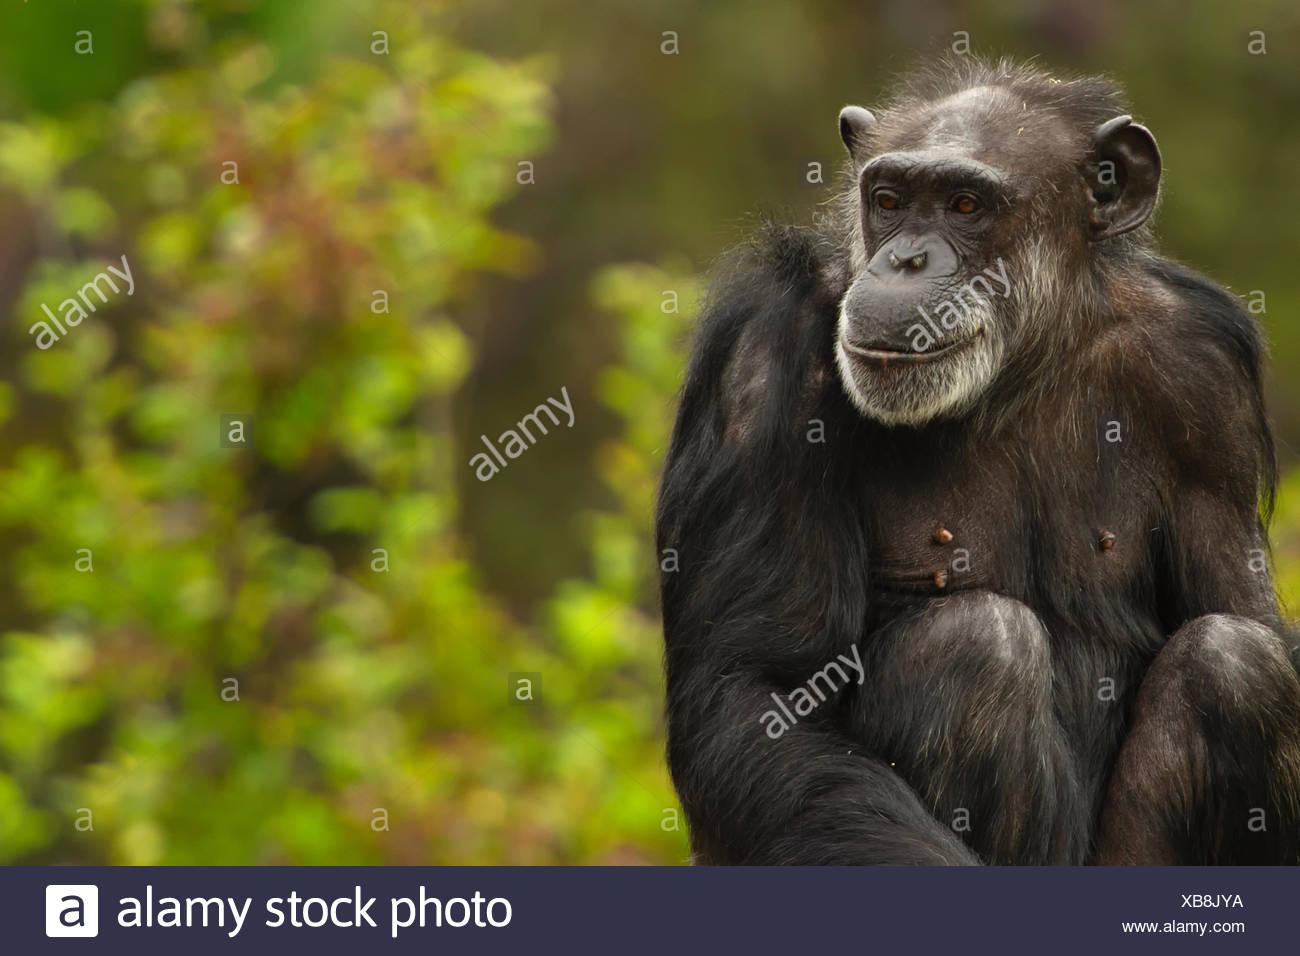 Chimpanzee Usa Stock Photos Amp Chimpanzee Usa Stock Images